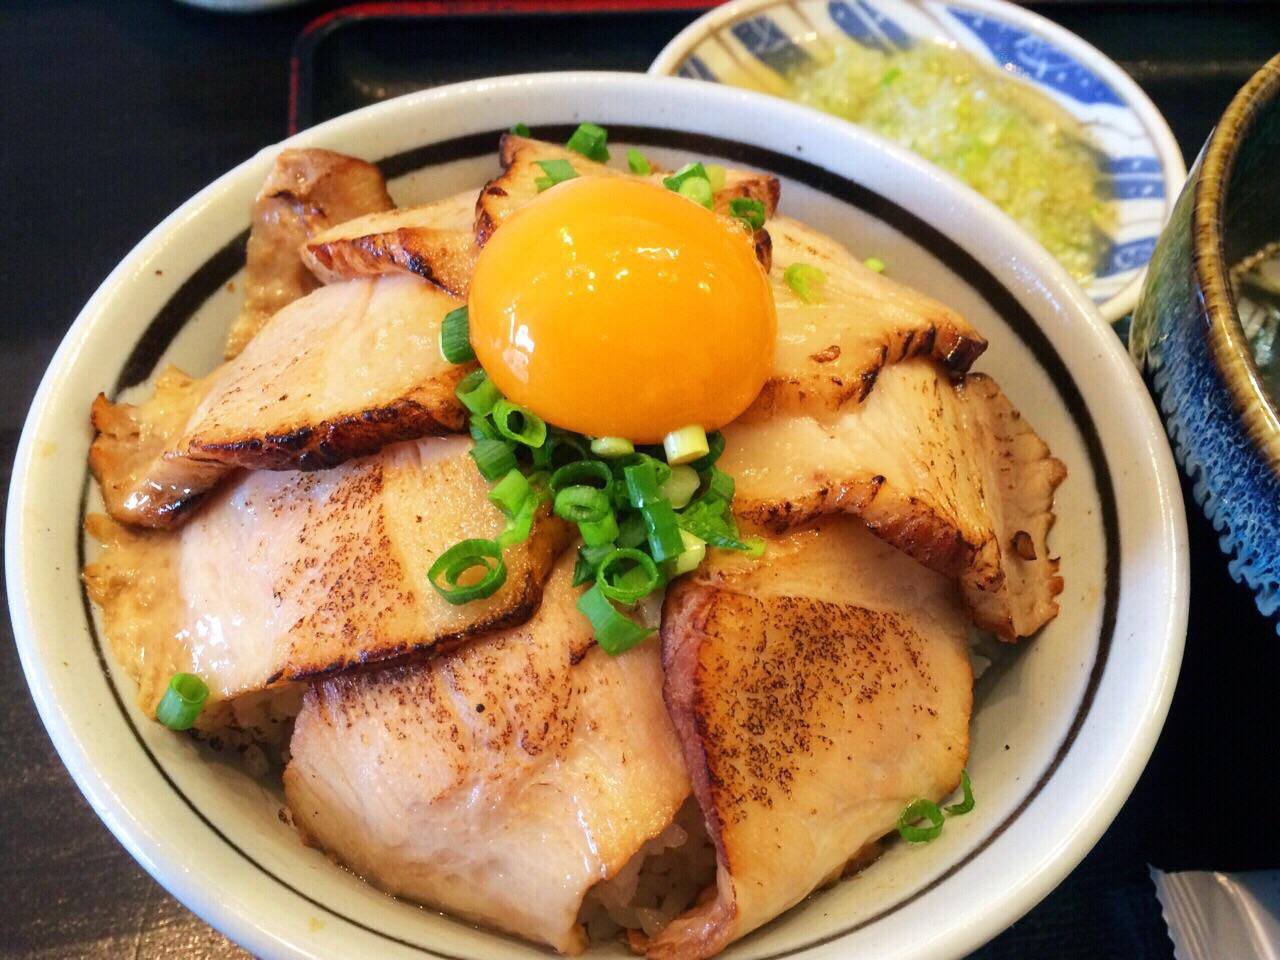 川崎市地方卸売市場南部市場ねぎ塩チャーシュー丼水喜